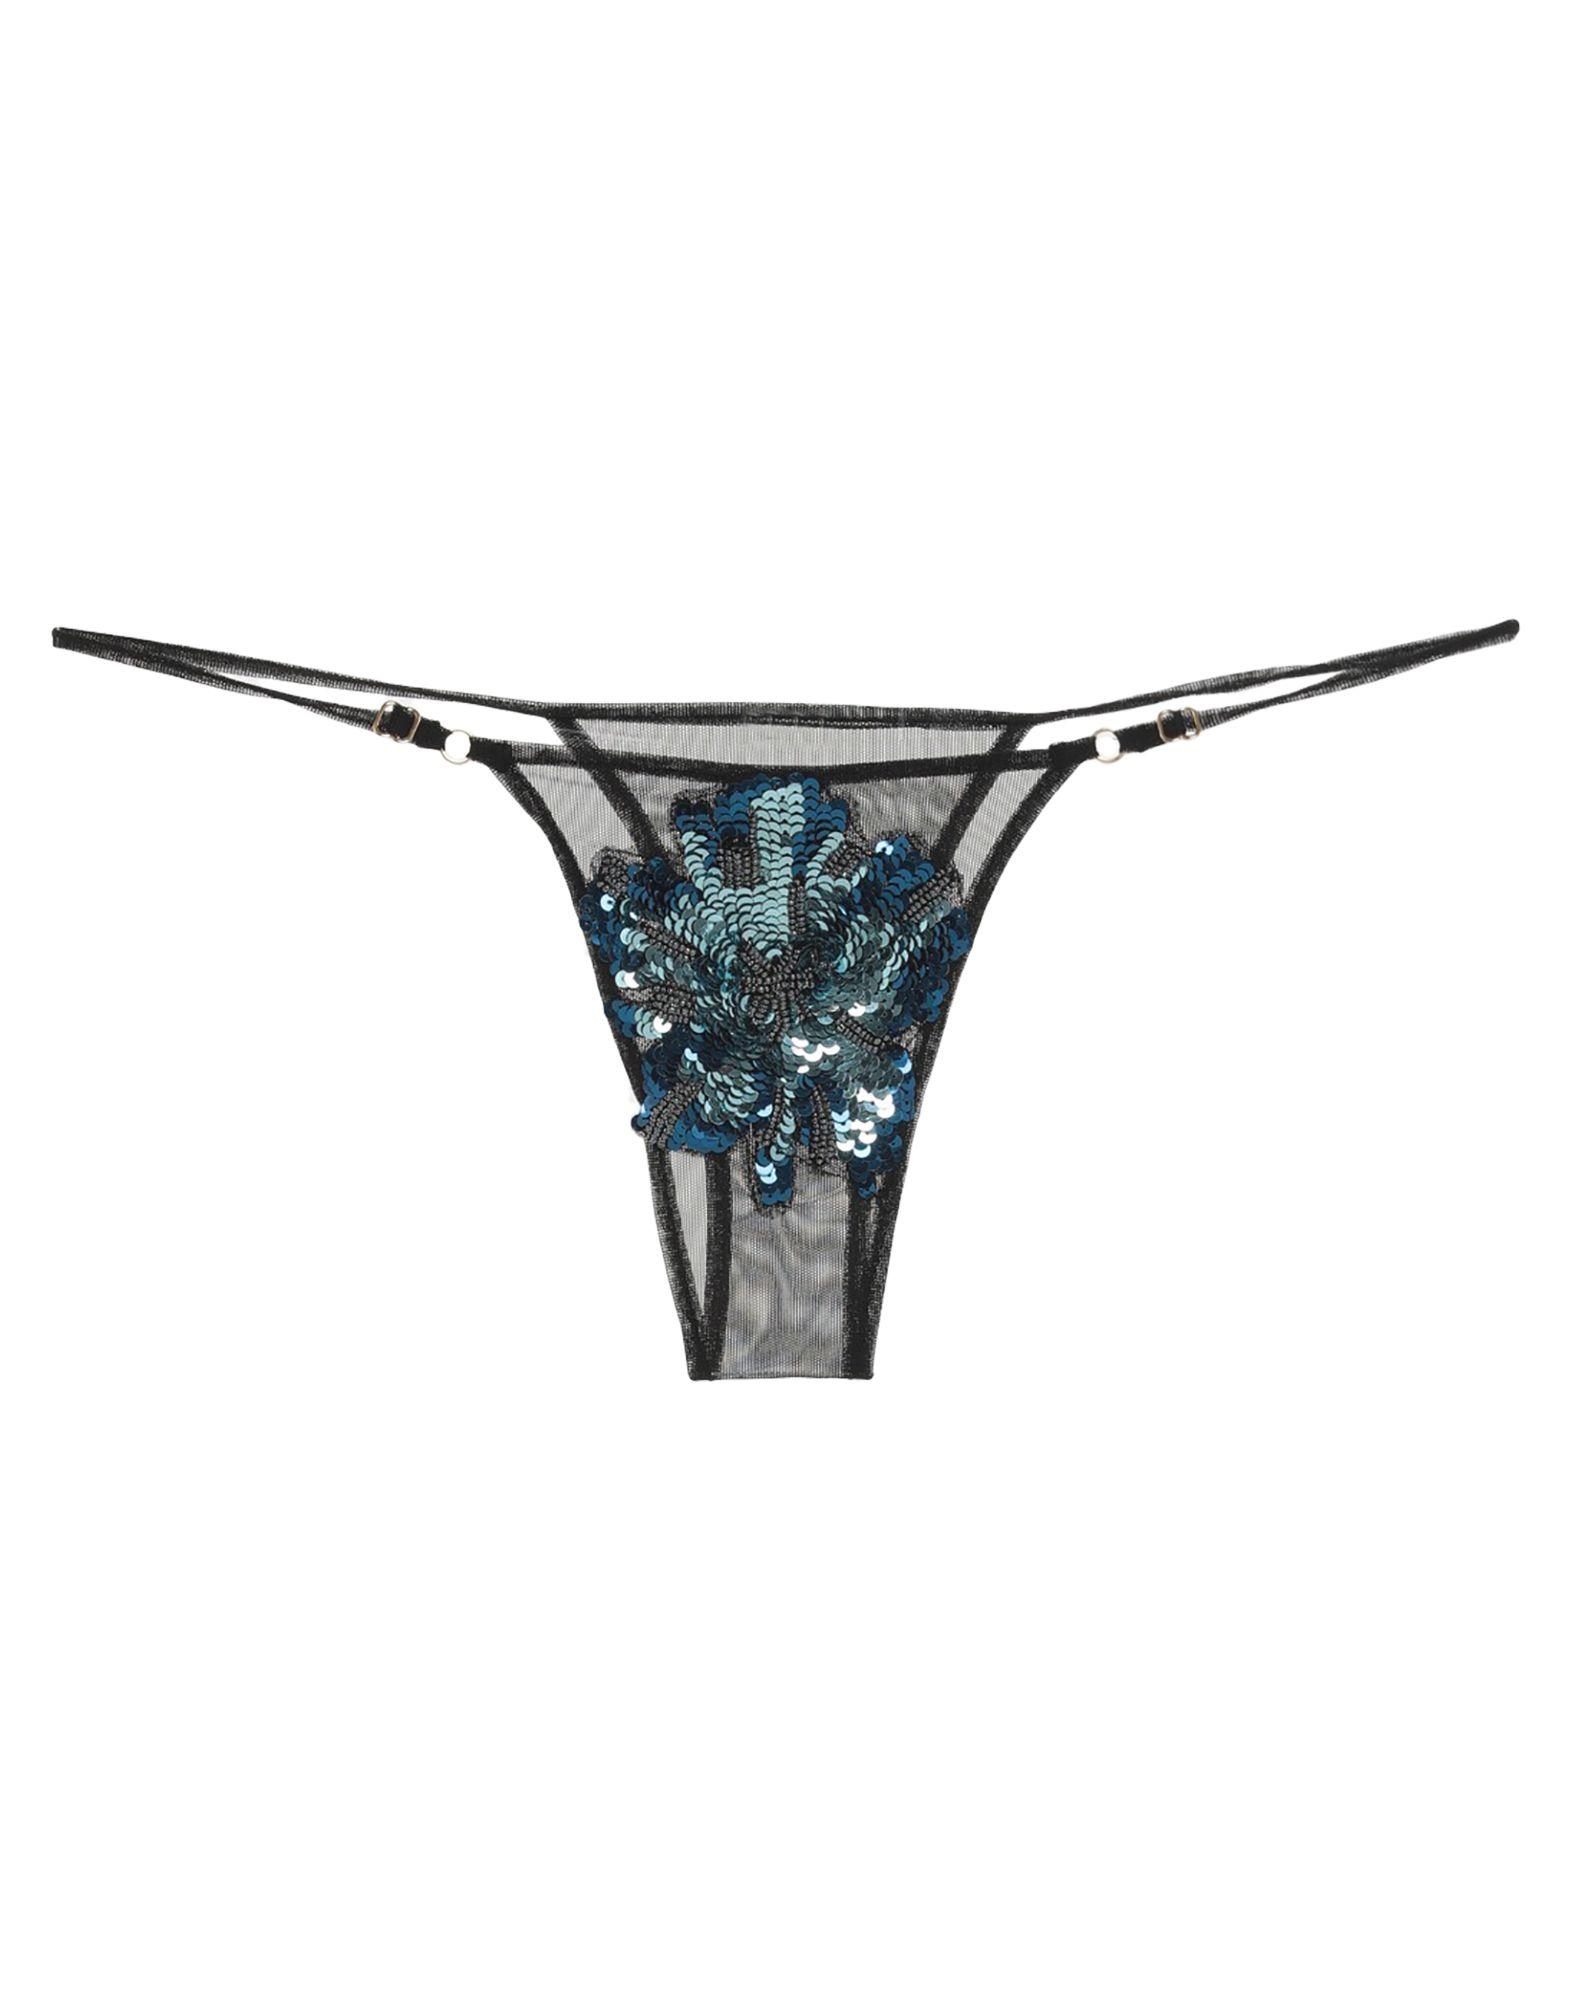 ESTER Lingerie Трусы-стринги twin set lingerie трусы